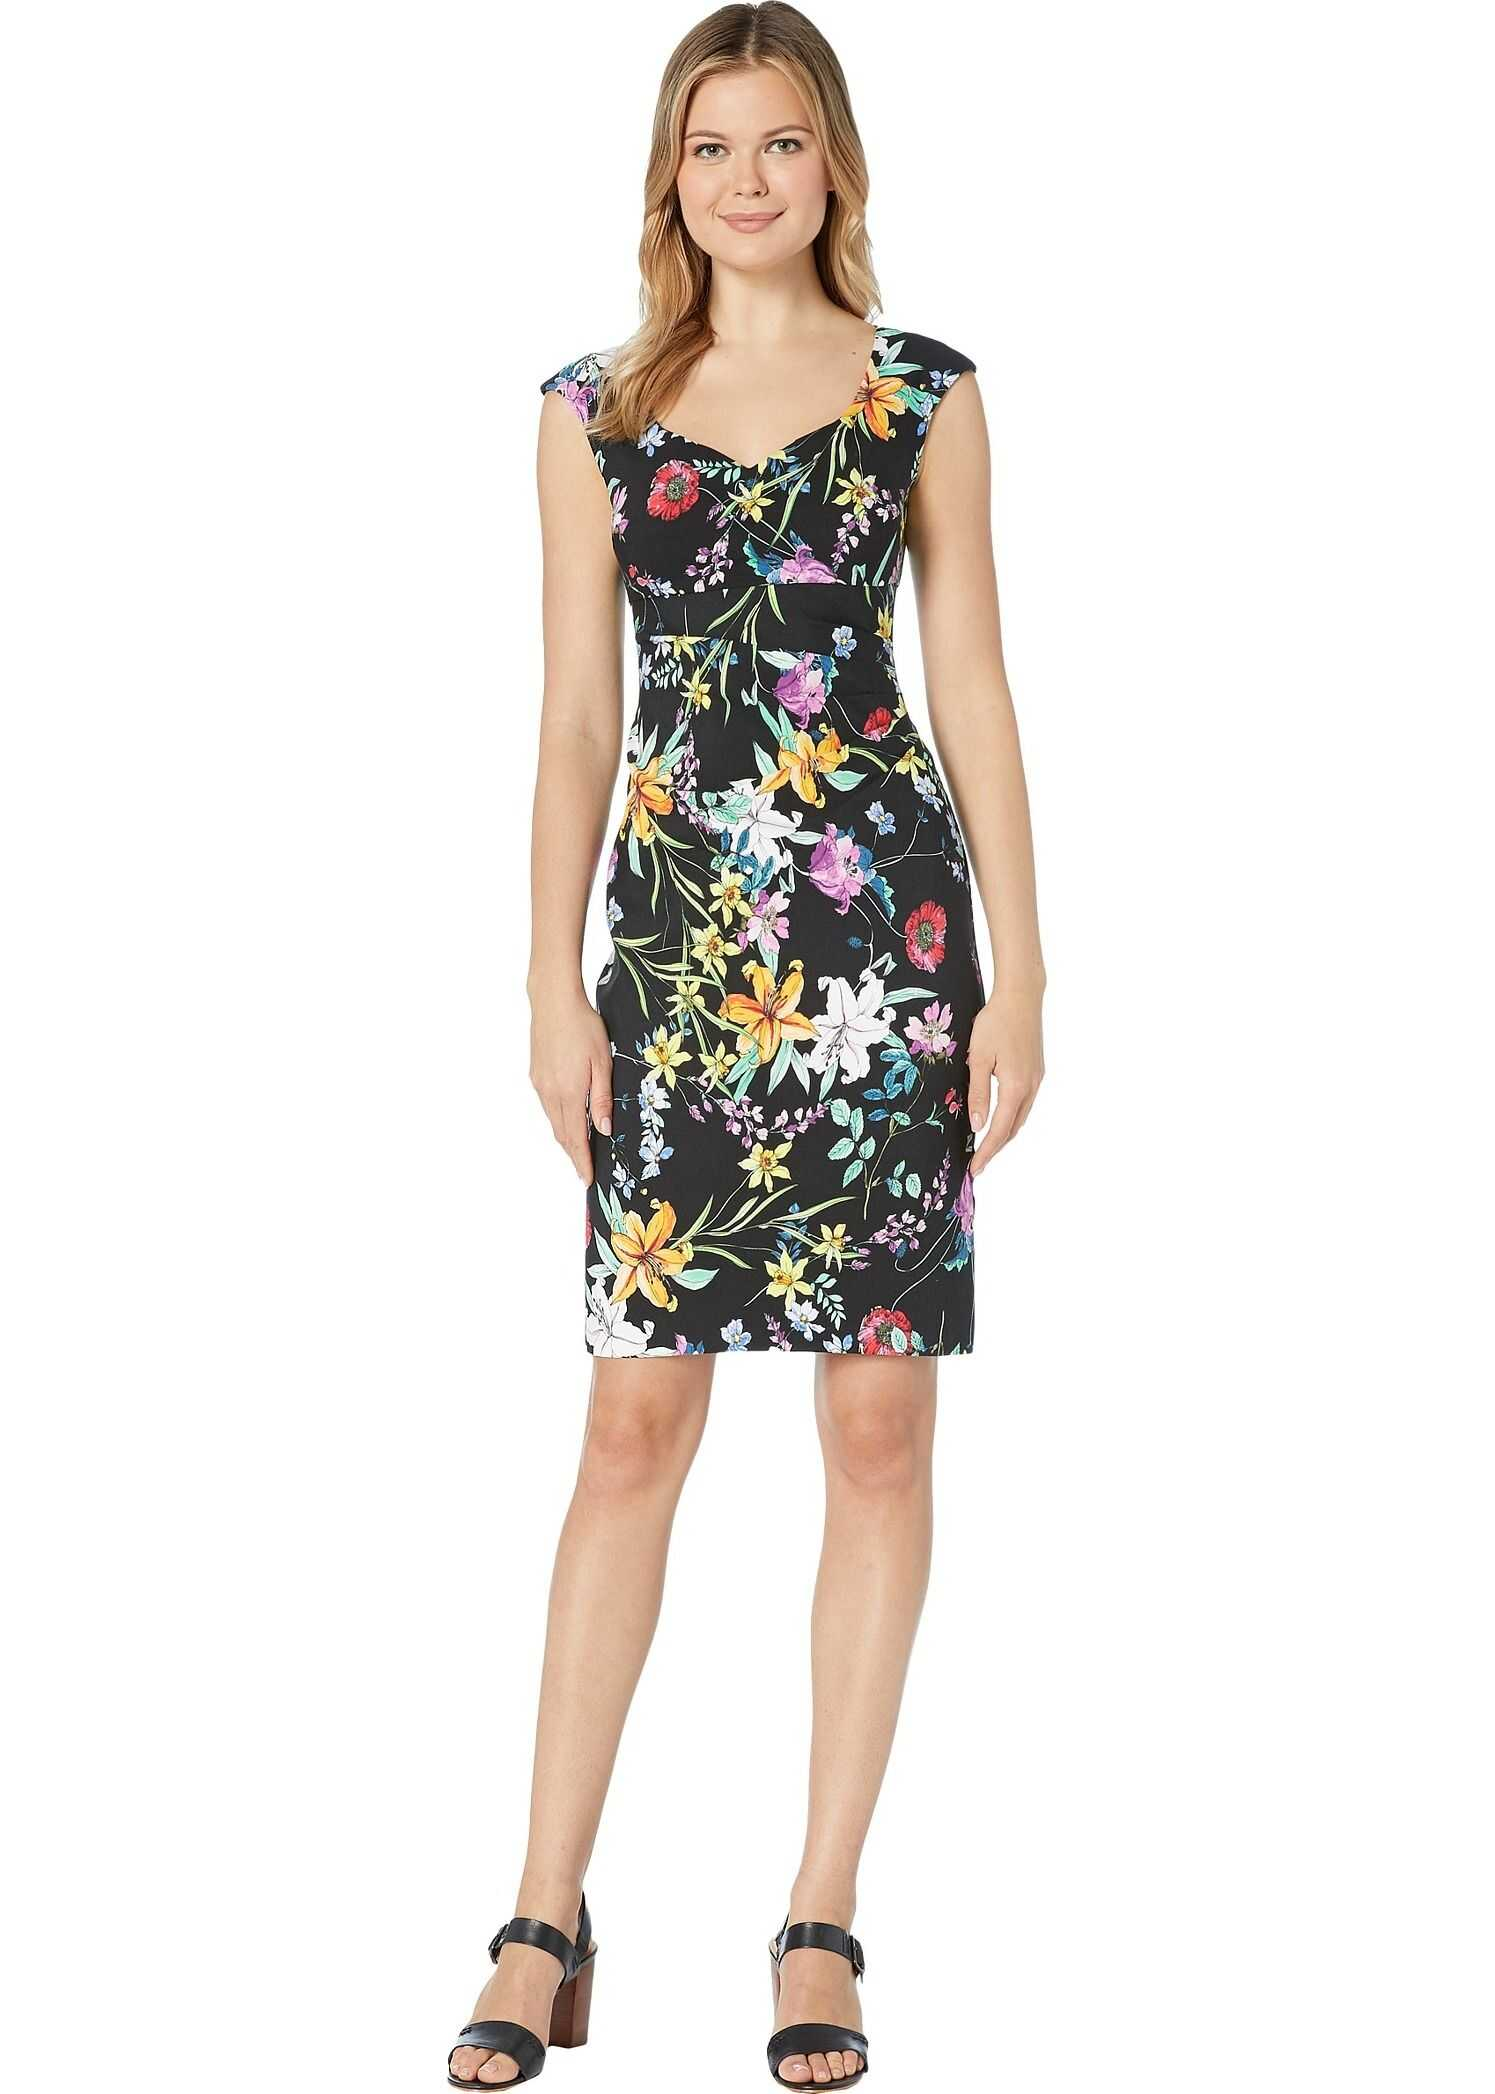 Adrianna Papell Printed Zenya Side Drape Sheath Dress Black Multi